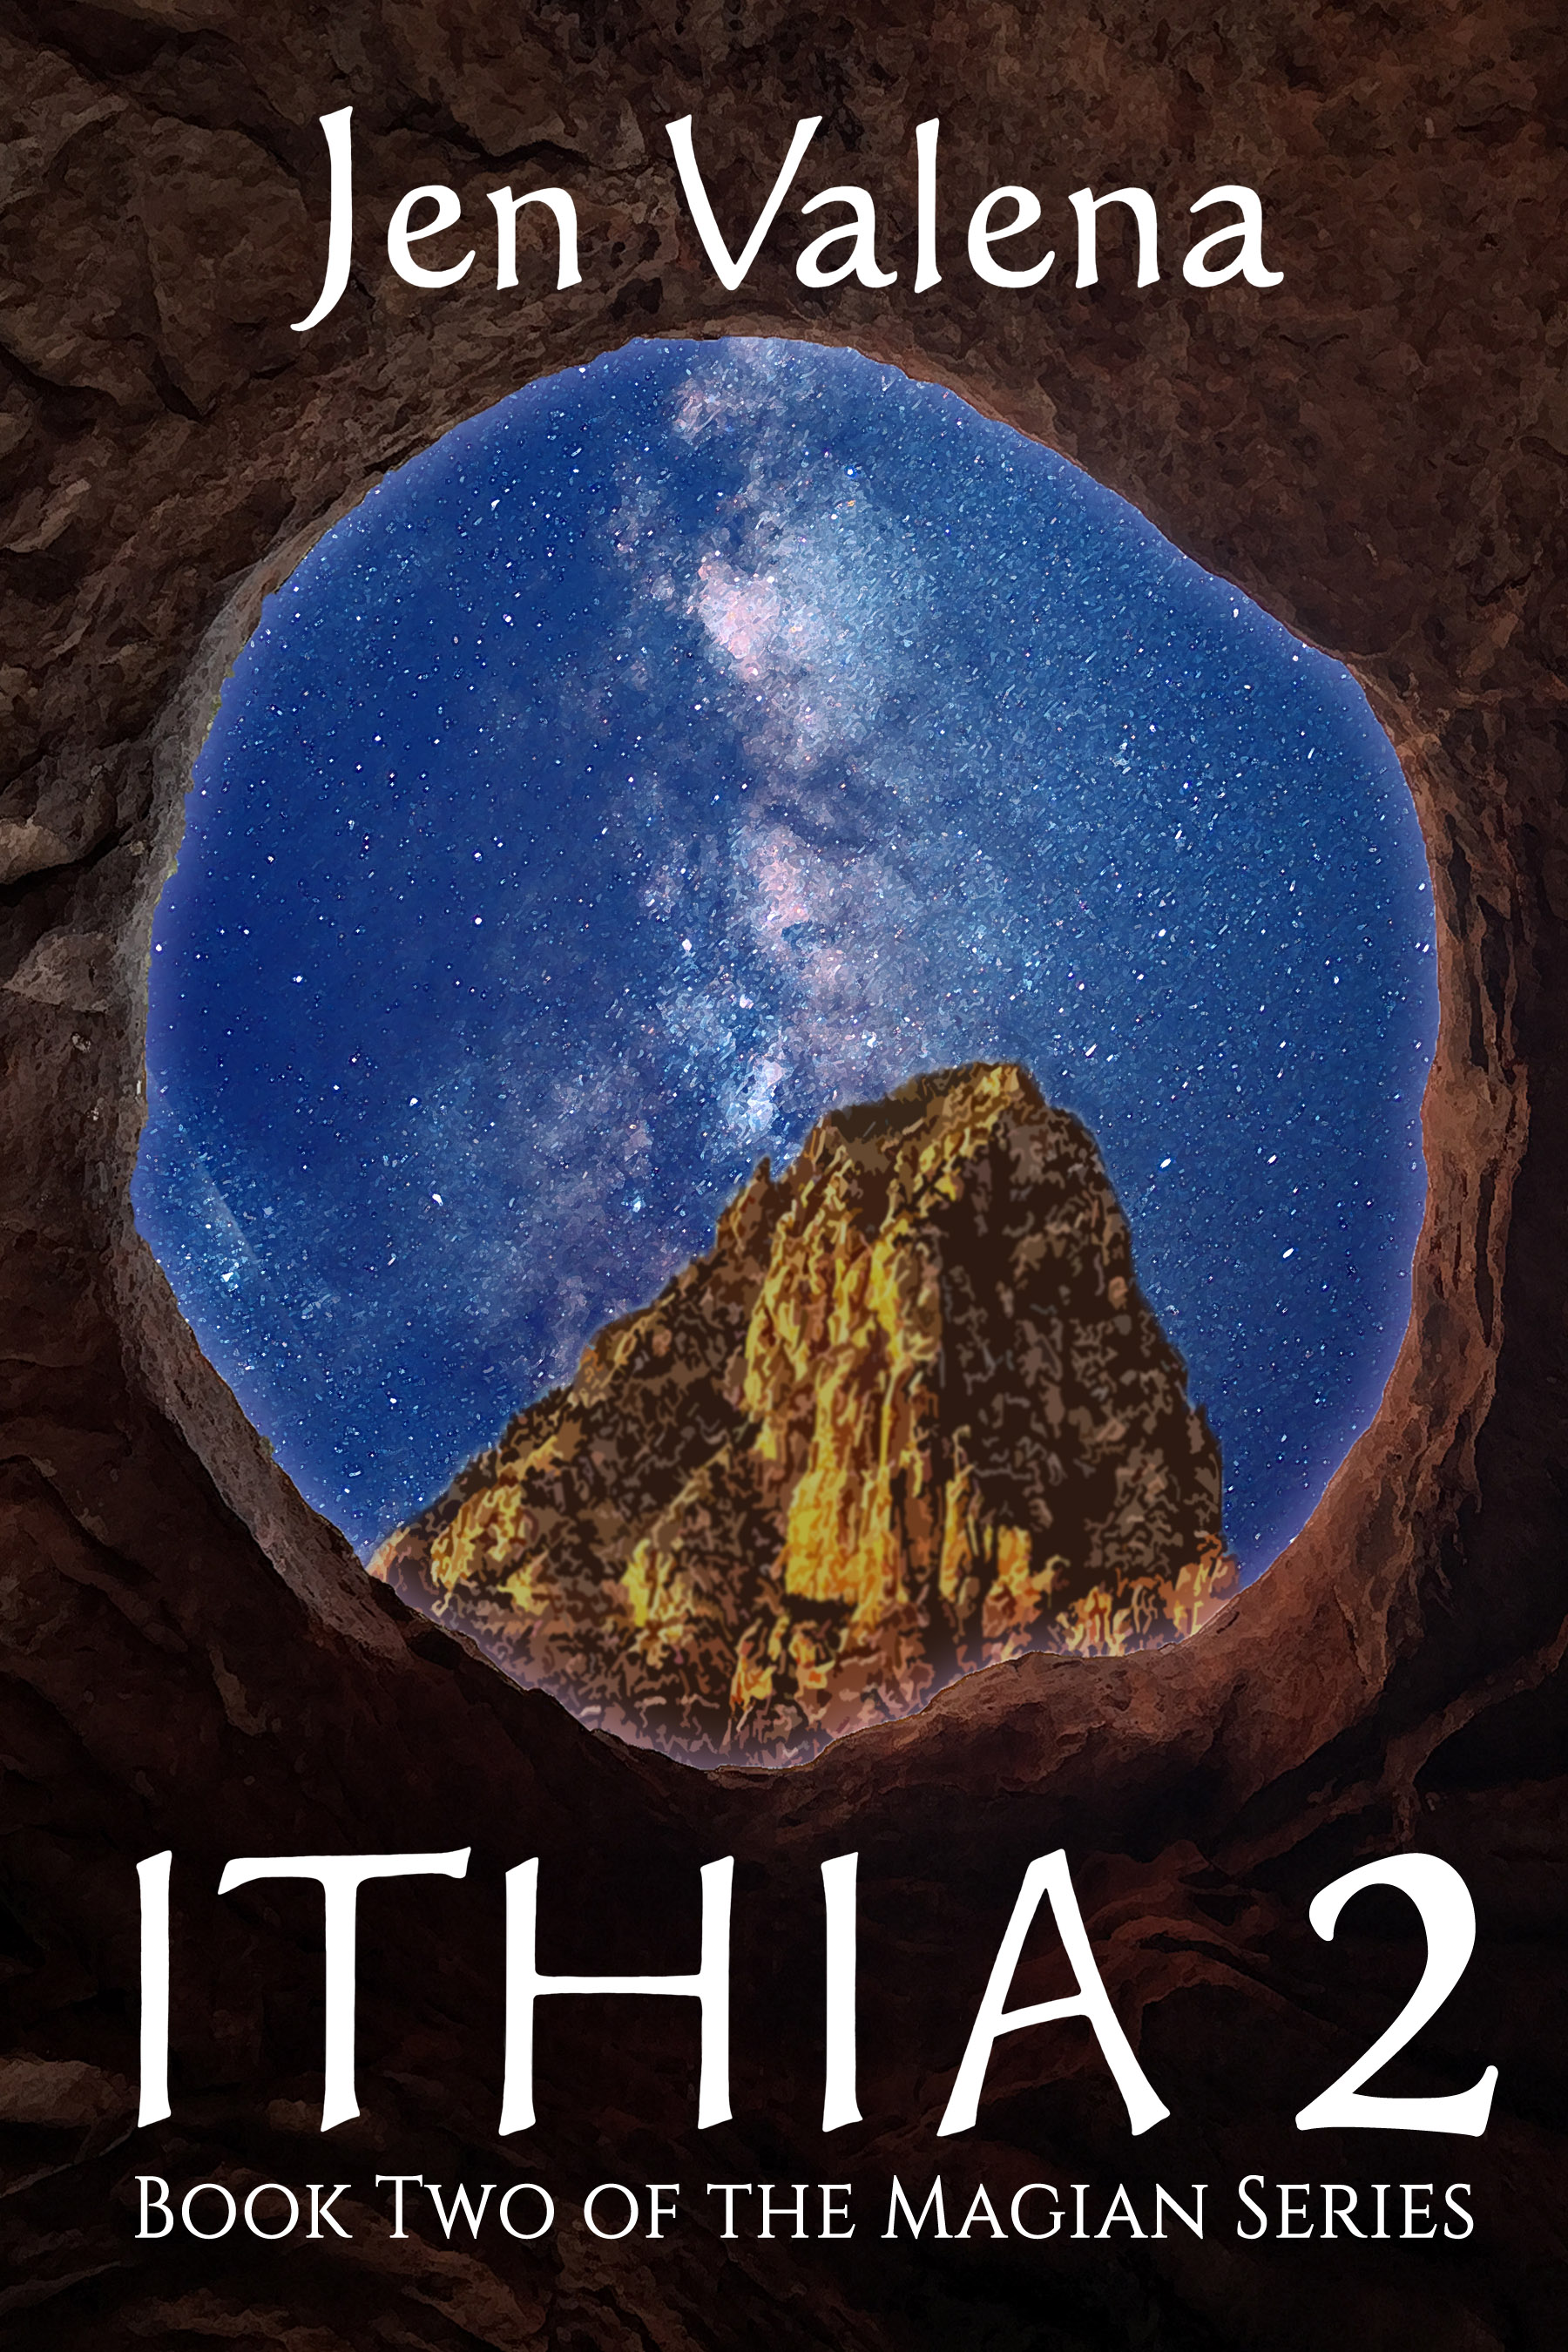 ithia2cover.jpg